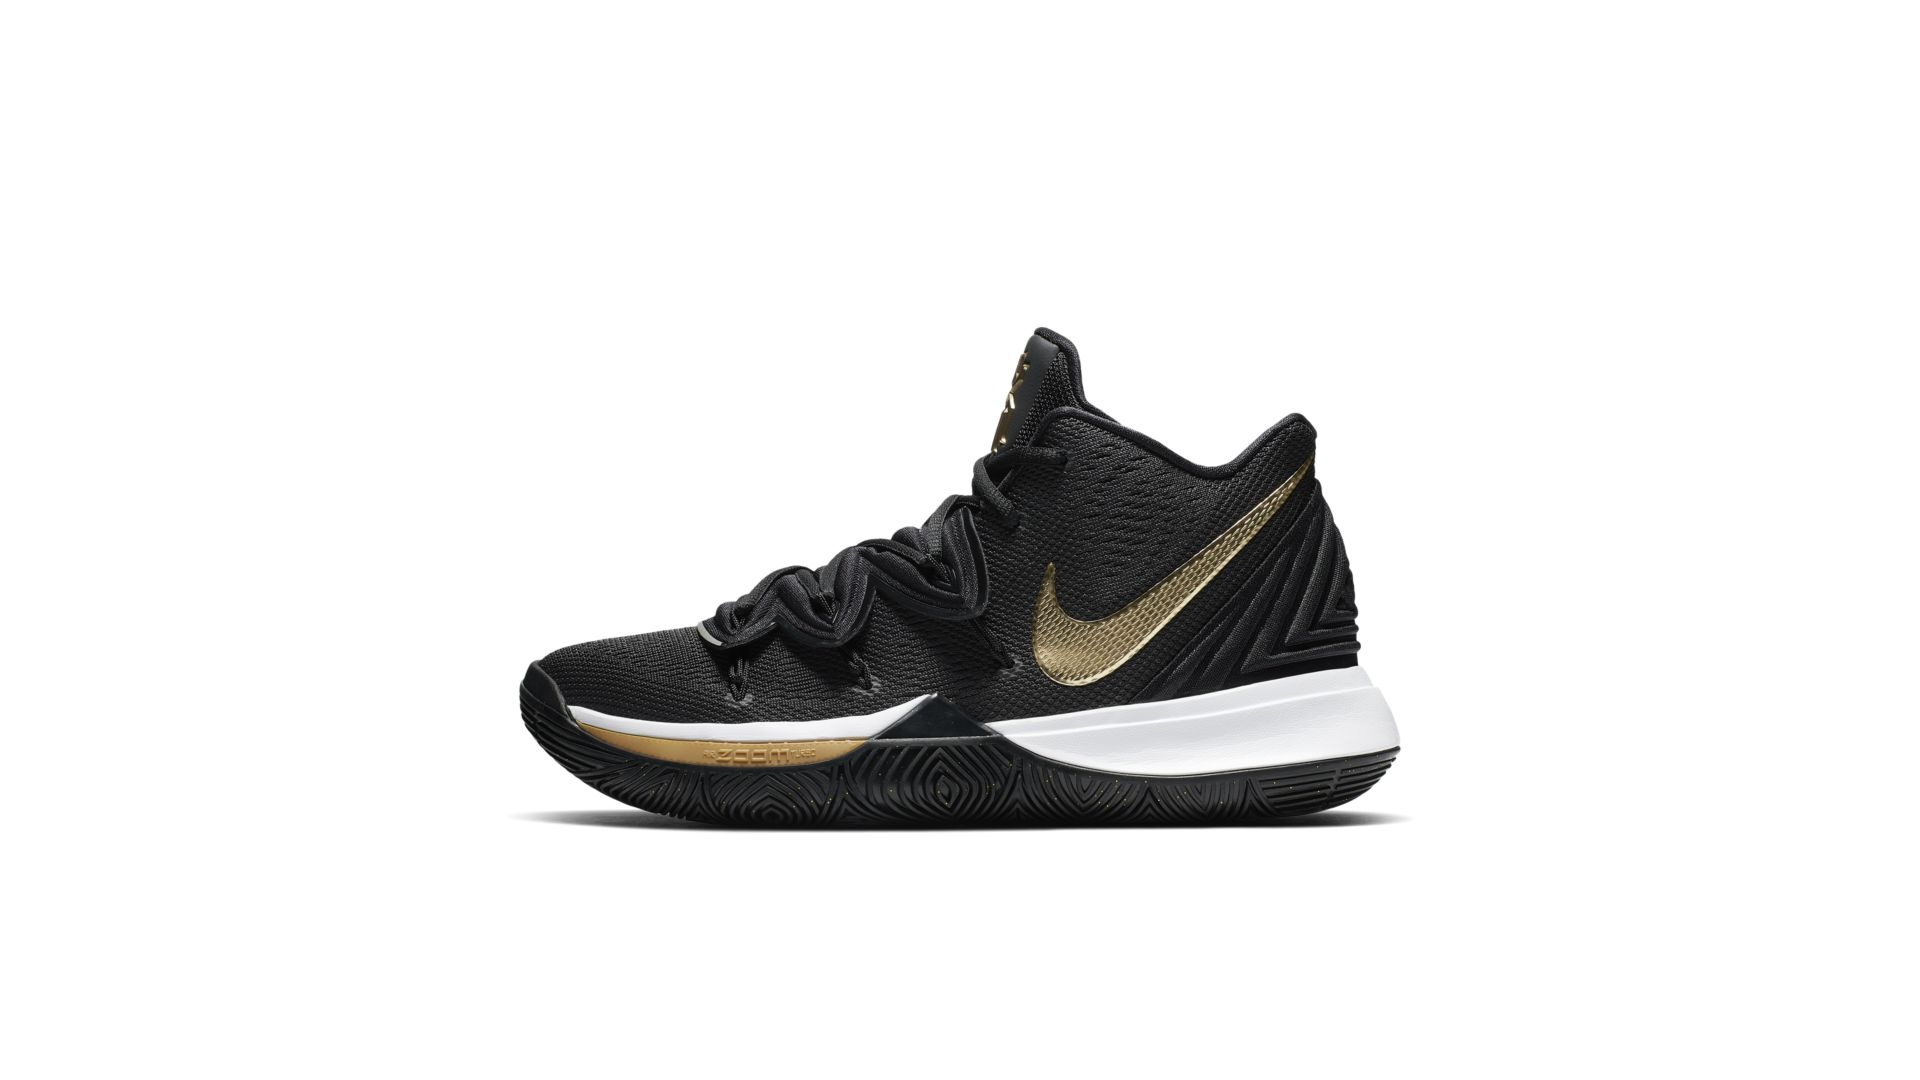 Nike Kyrie 5 Black Metallic Gold (AO2918-007)